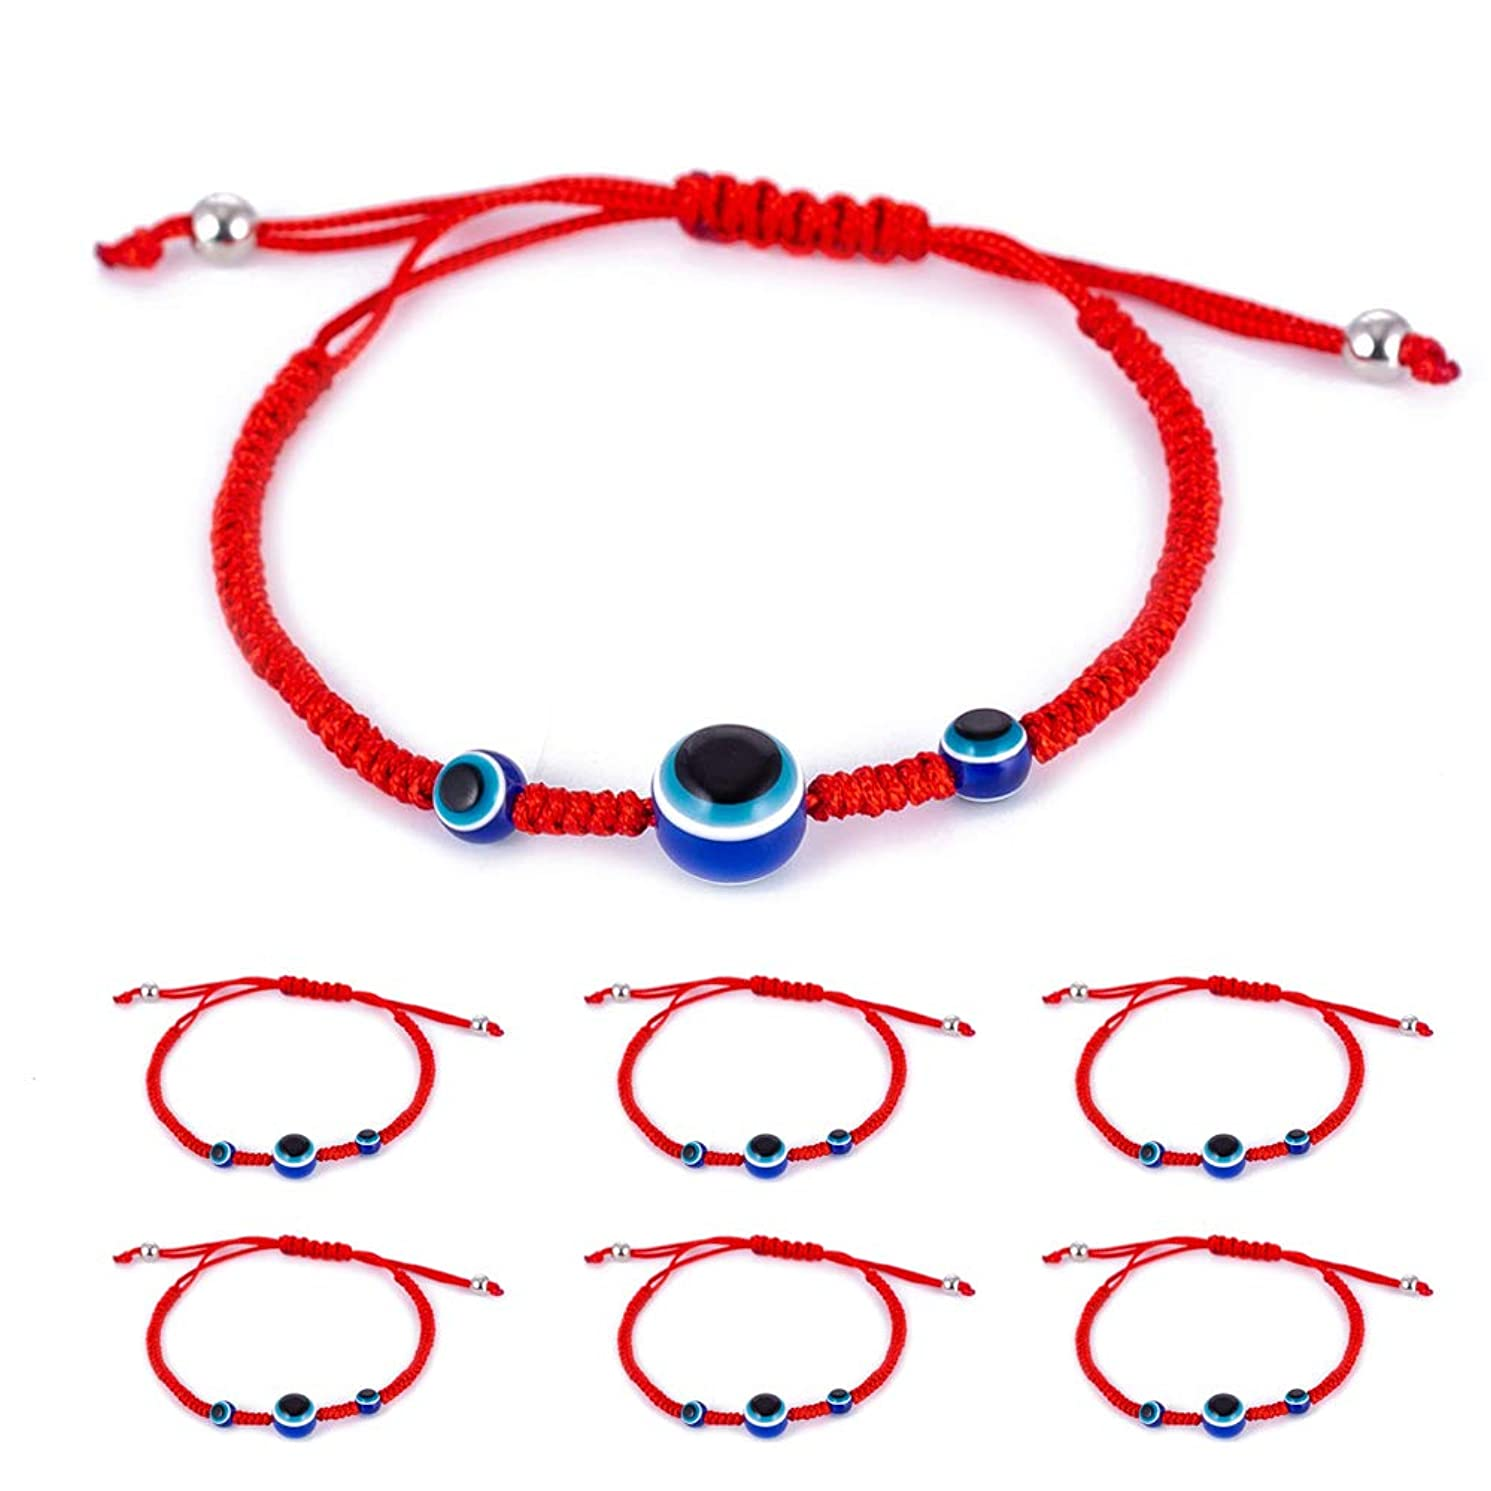 6pcs Evil Eye Hamsa Hand String Kabbalah Bracelets for Protection and Luck Hand-Woven Red Black Cord Thread Friendship Bracelet Anklet